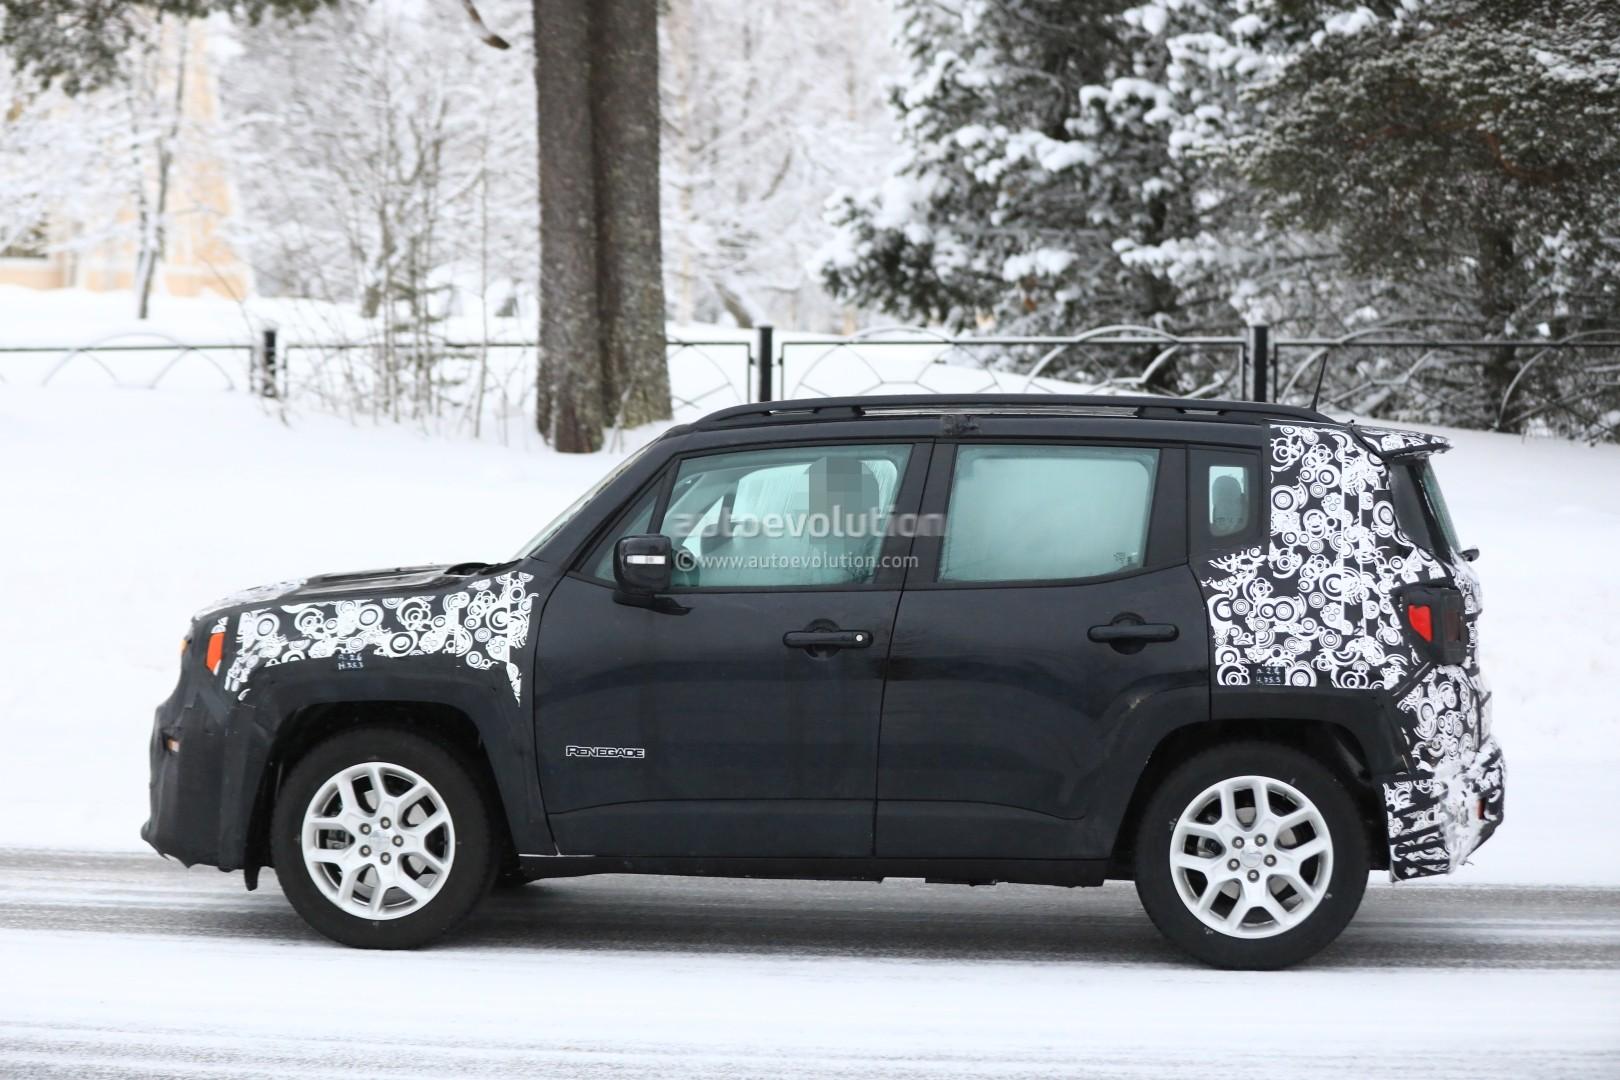 Spyshots 2019 Jeep Renegade Facelift Reveals Updated